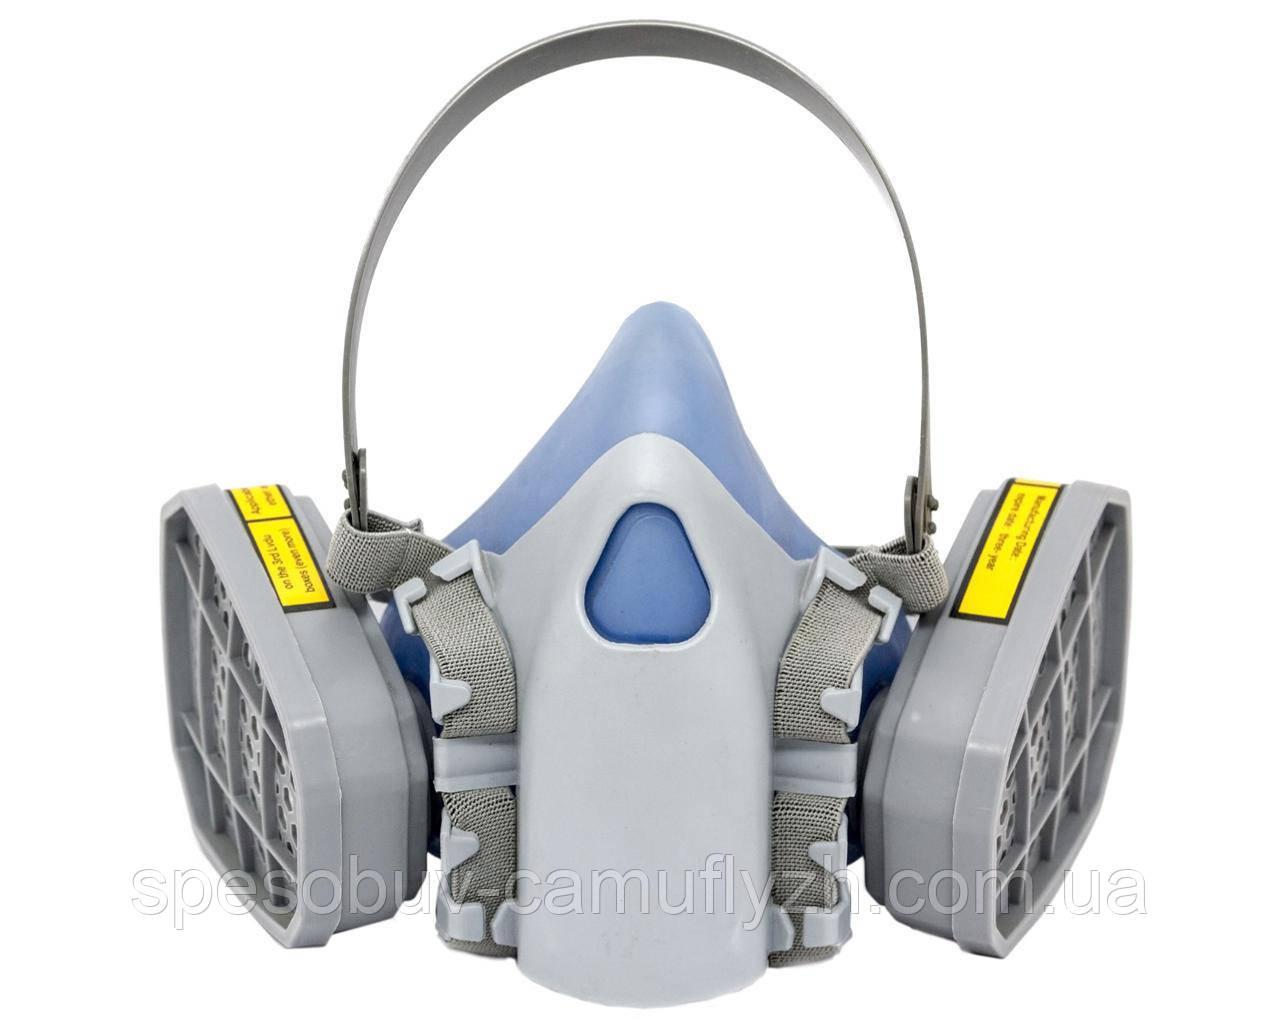 Респіратор маска Хімік-2 з двома фільтрами А1 (аналог 3М 7500) клас захисту FFP2